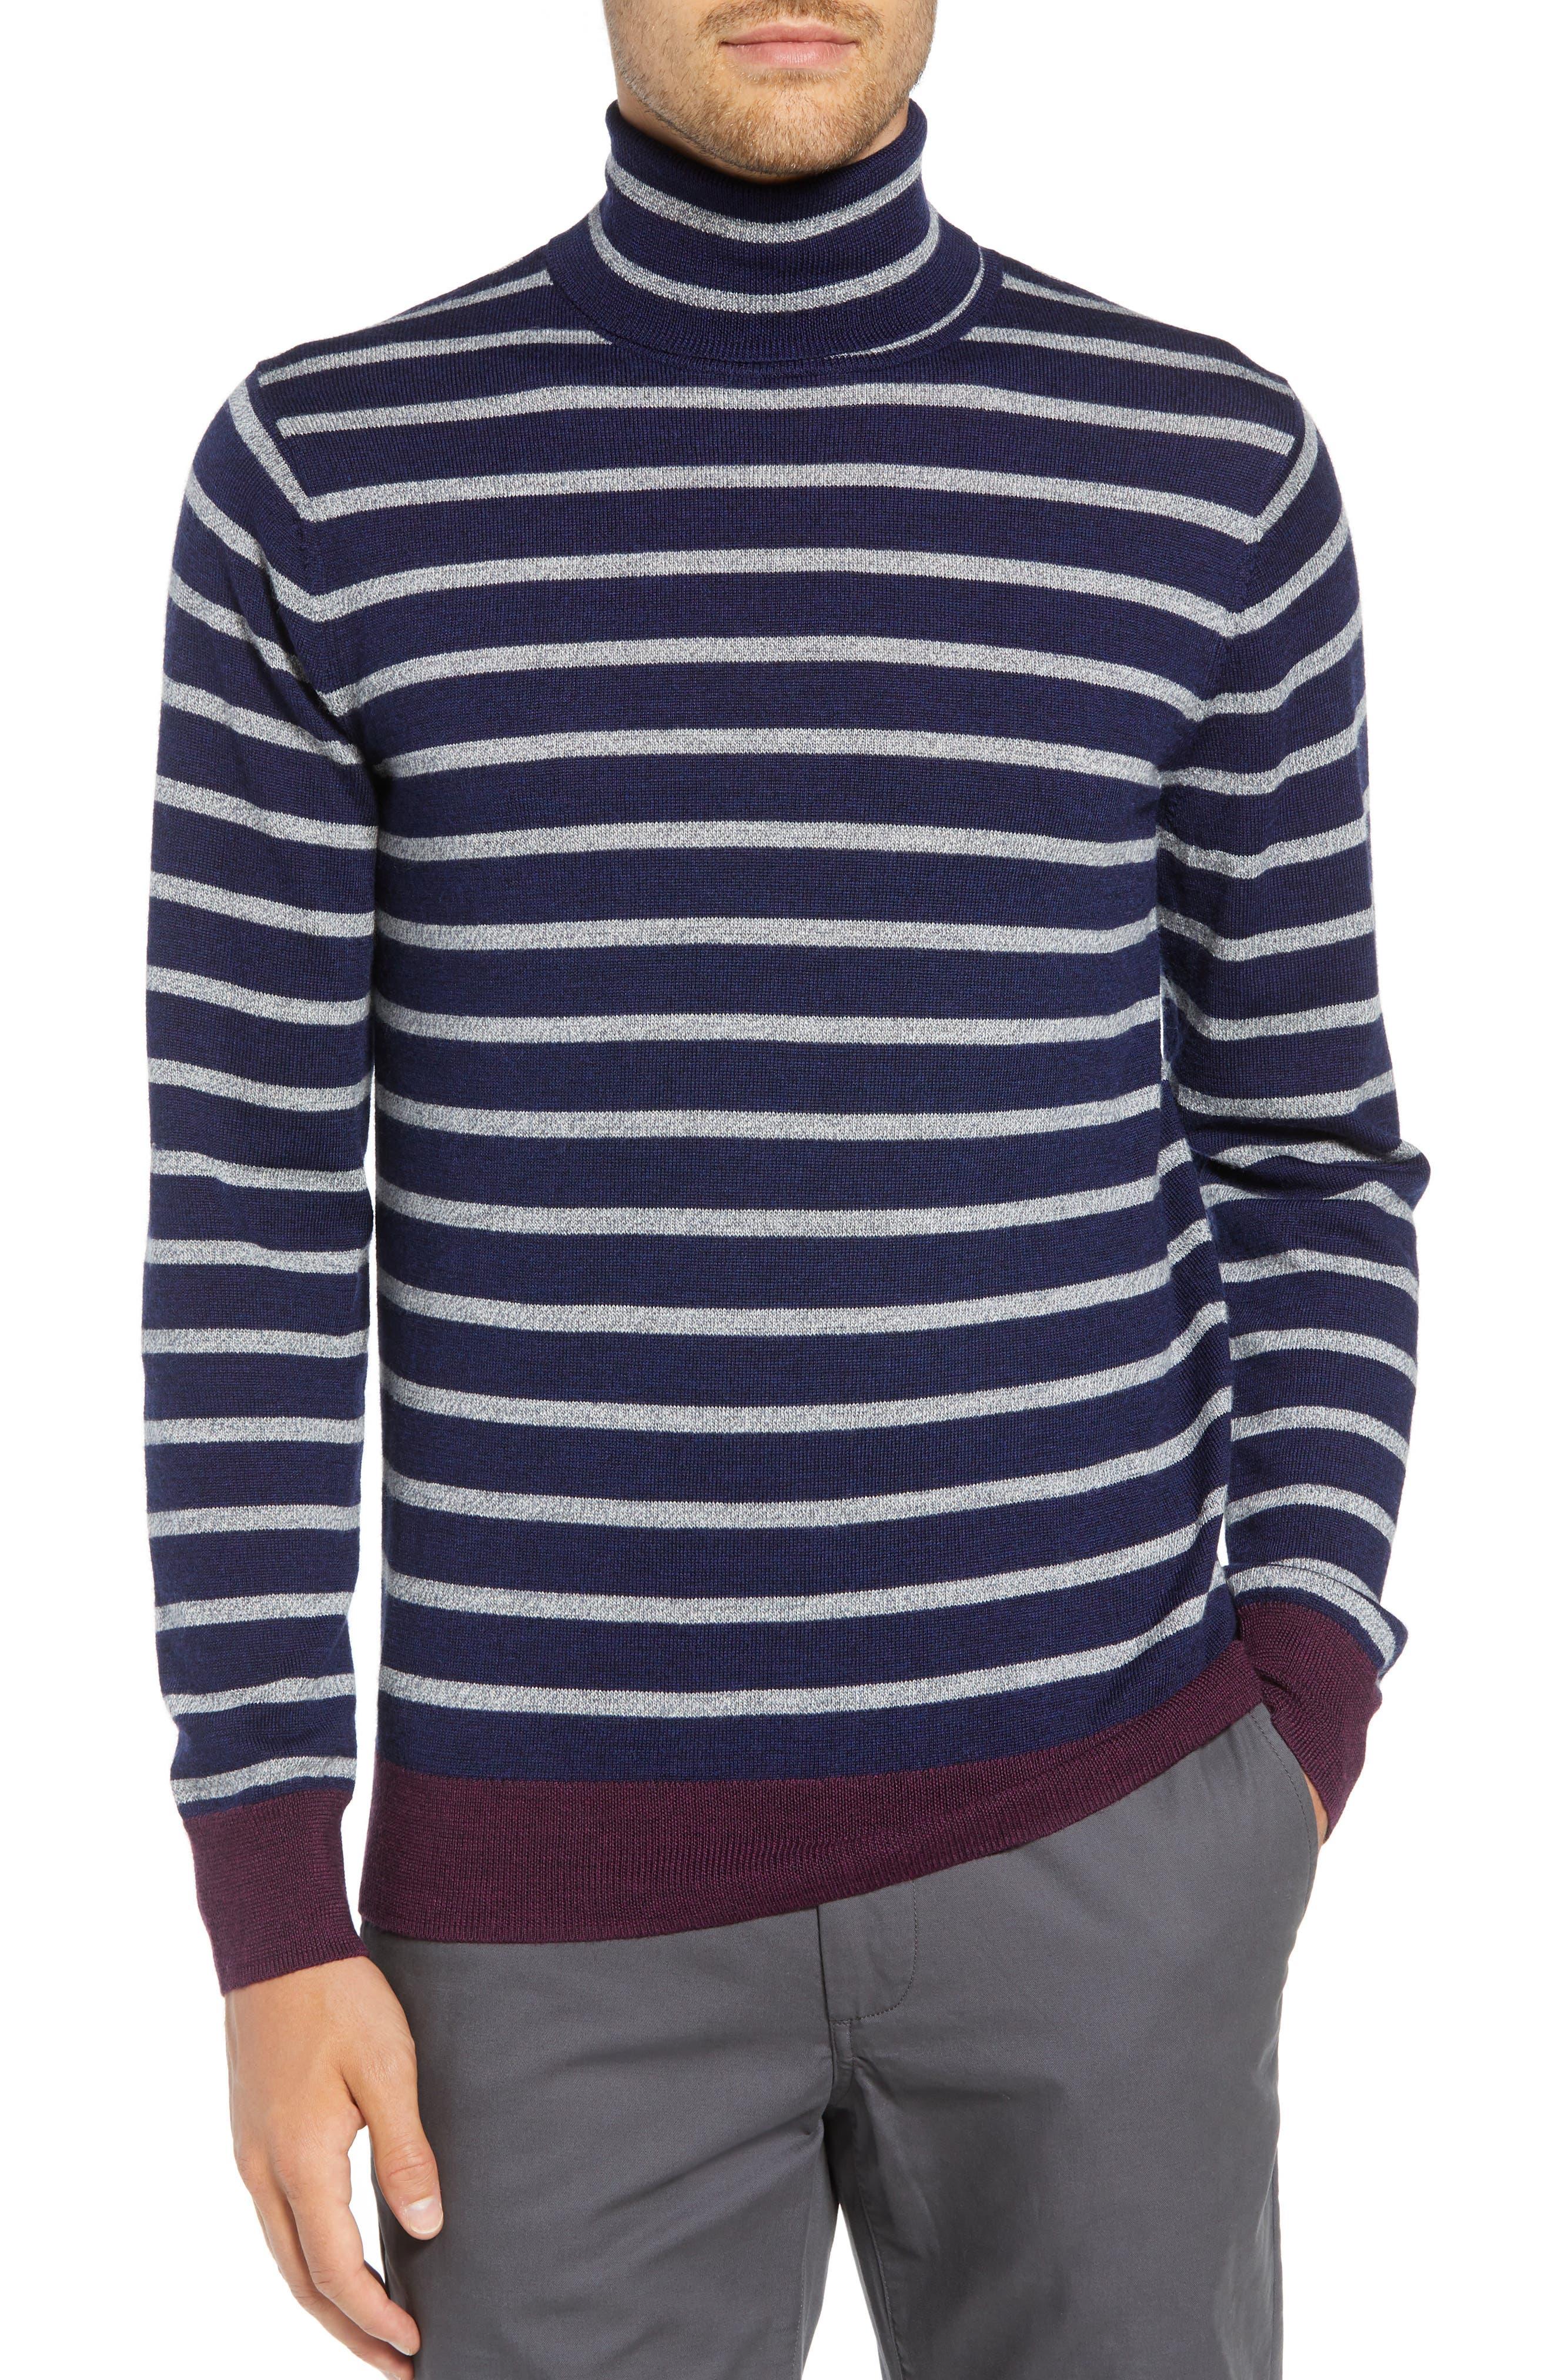 Slim Fit Turtleneck Merino Wool Sweater,                         Main,                         color, HEATHER INK/ COOL GREY